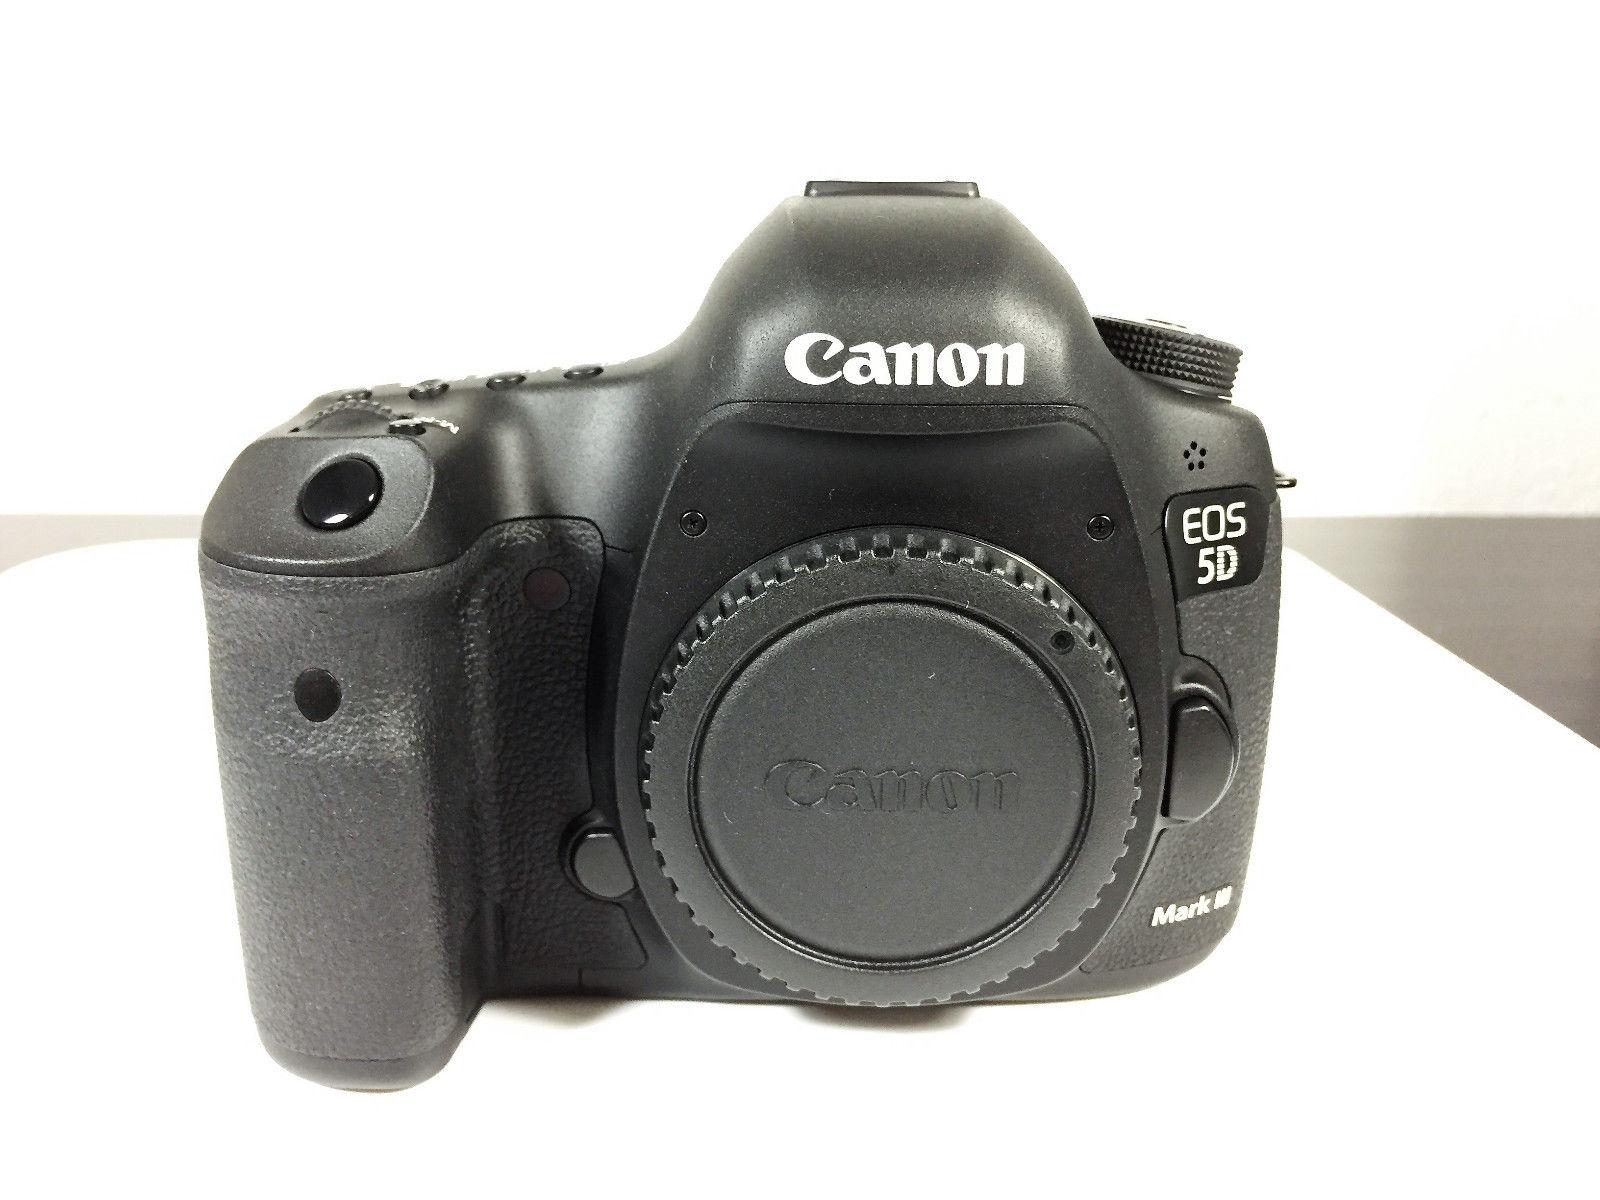 Canon EOS 5D Mark III DSLR Digitalkamera (Gehäuse/Body) - nur 6.227 Auslösungen